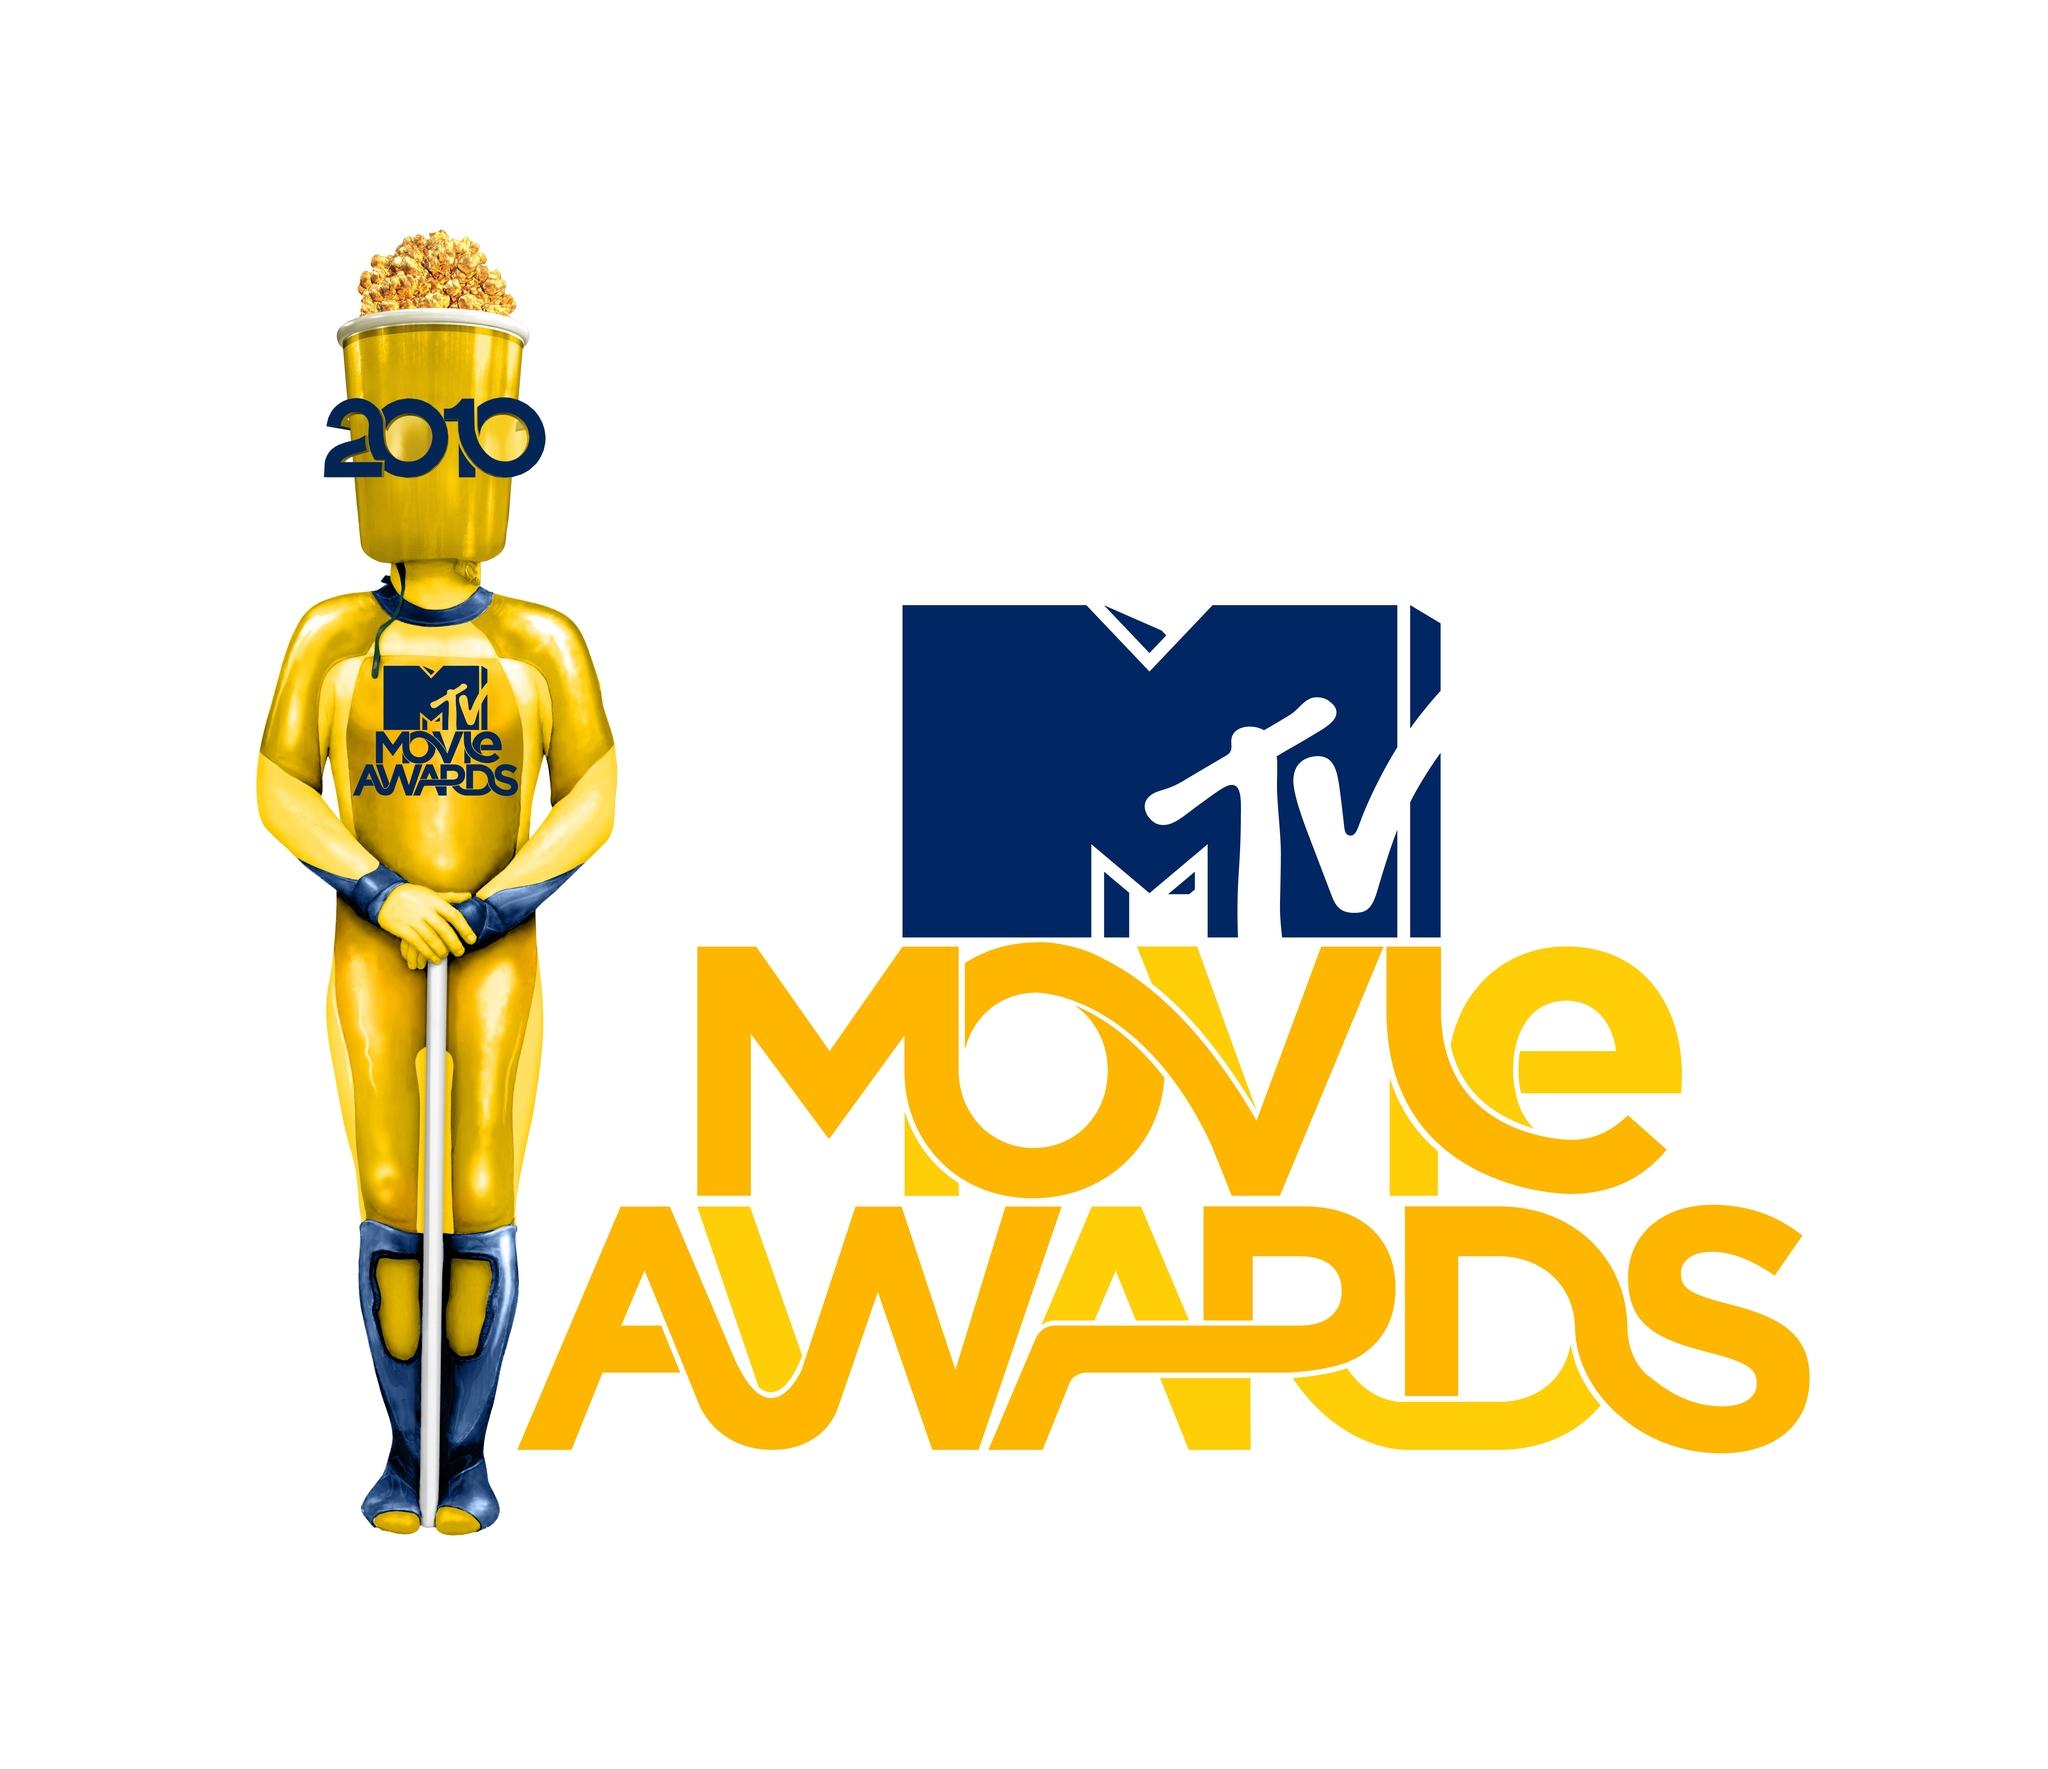 image 2010 MTV Movie Awards (2010) (TV) Watch Full Movie Free Online